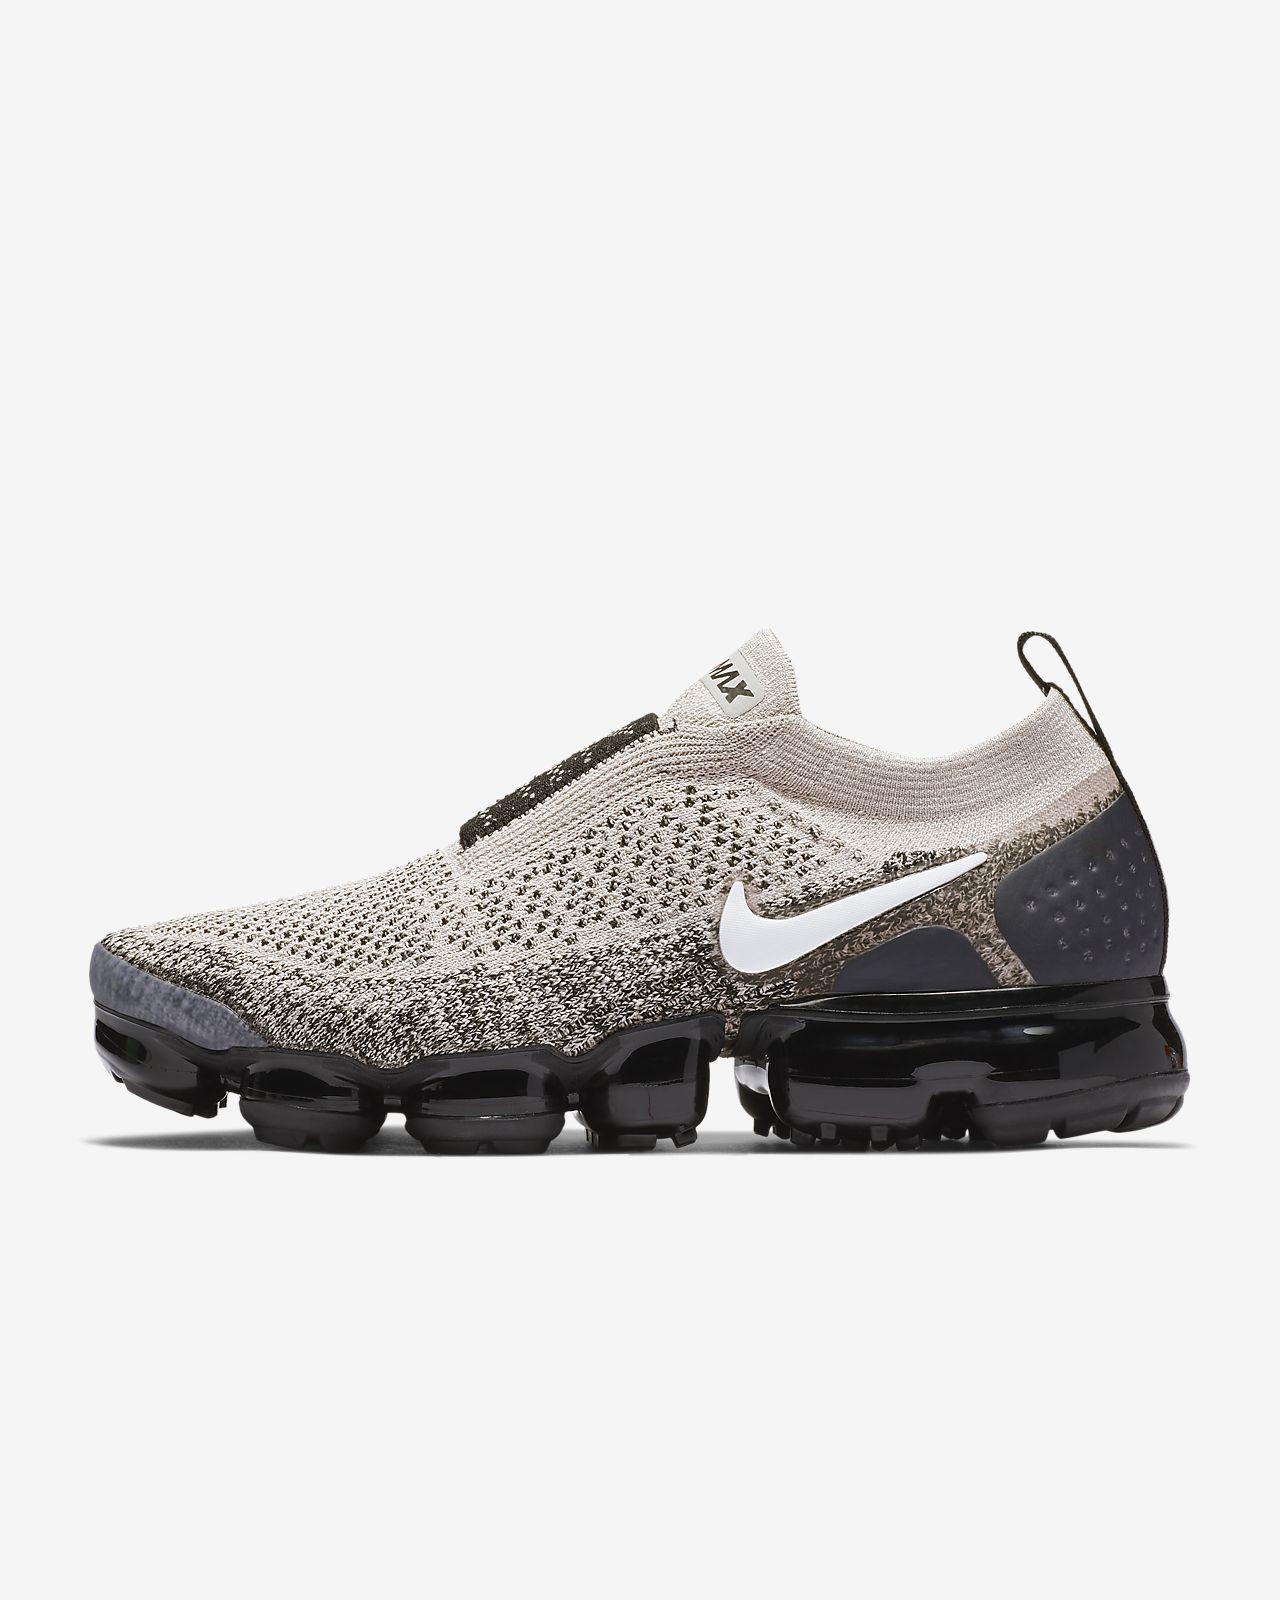 brand new 63ec4 3f348 ... Chaussure Nike Air VaporMax Flyknit Moc 2 pour Femme